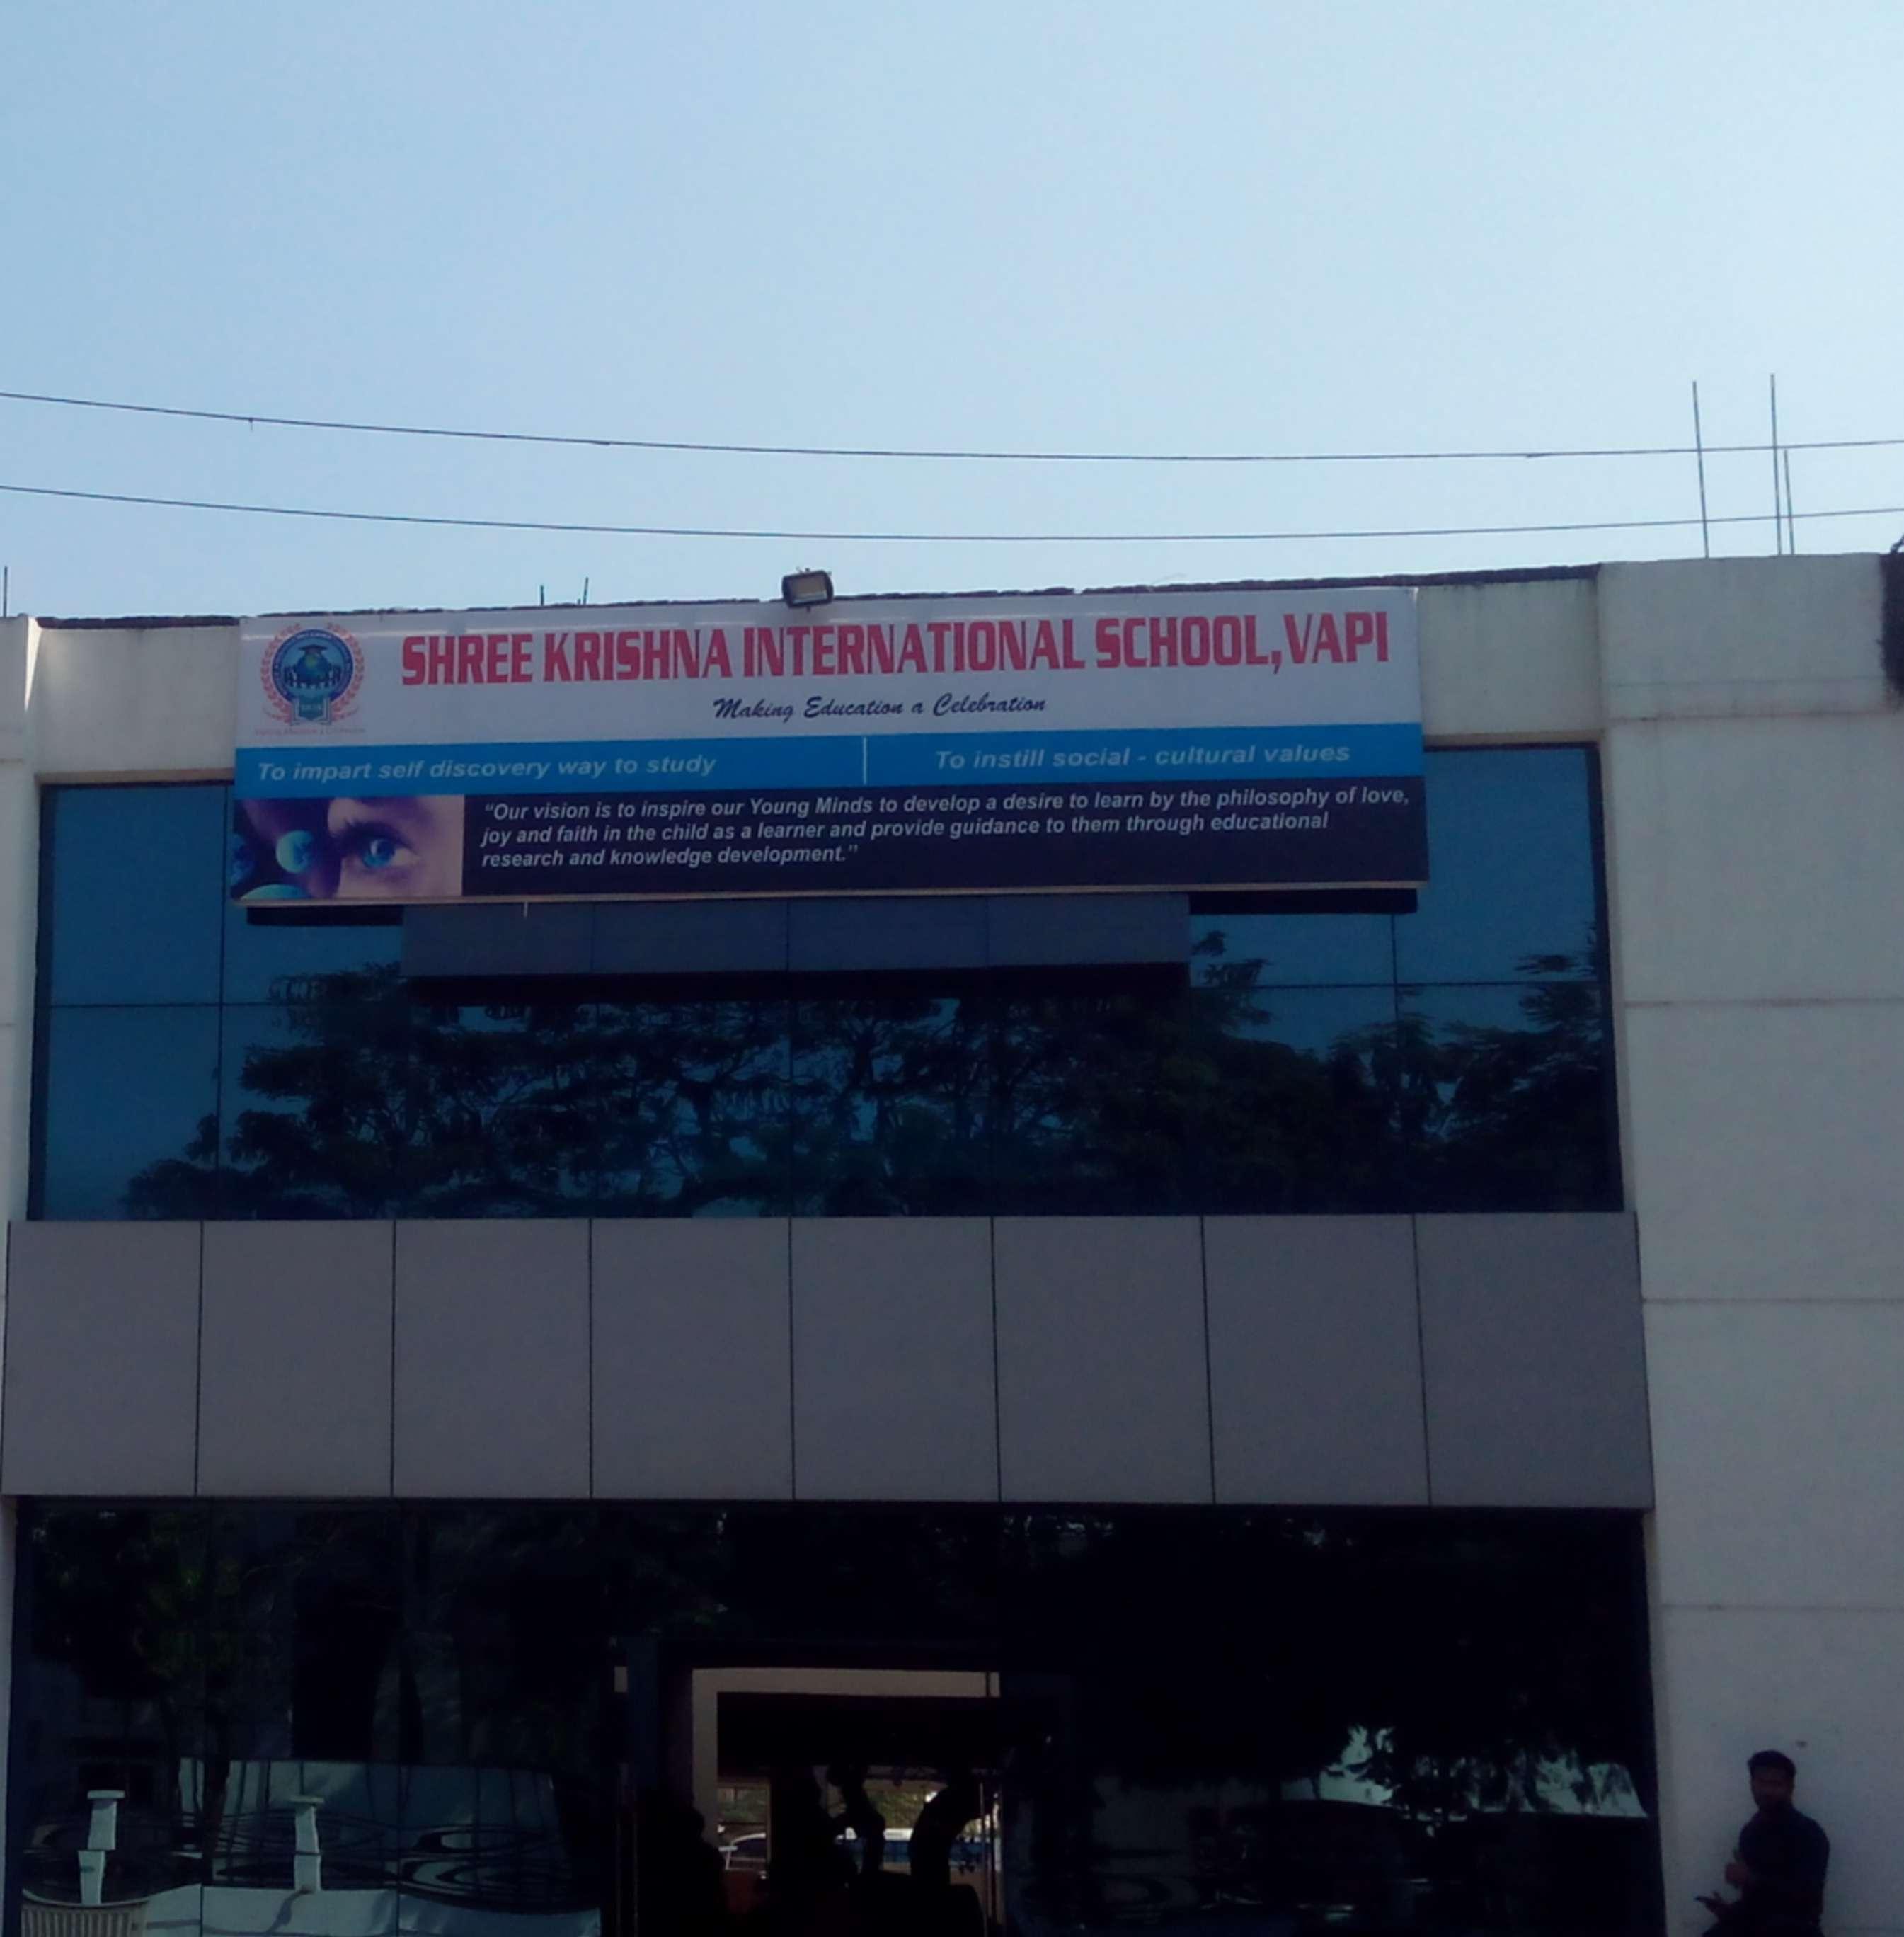 shree krishna international School plot no b13 14 charwada road vapi 430194